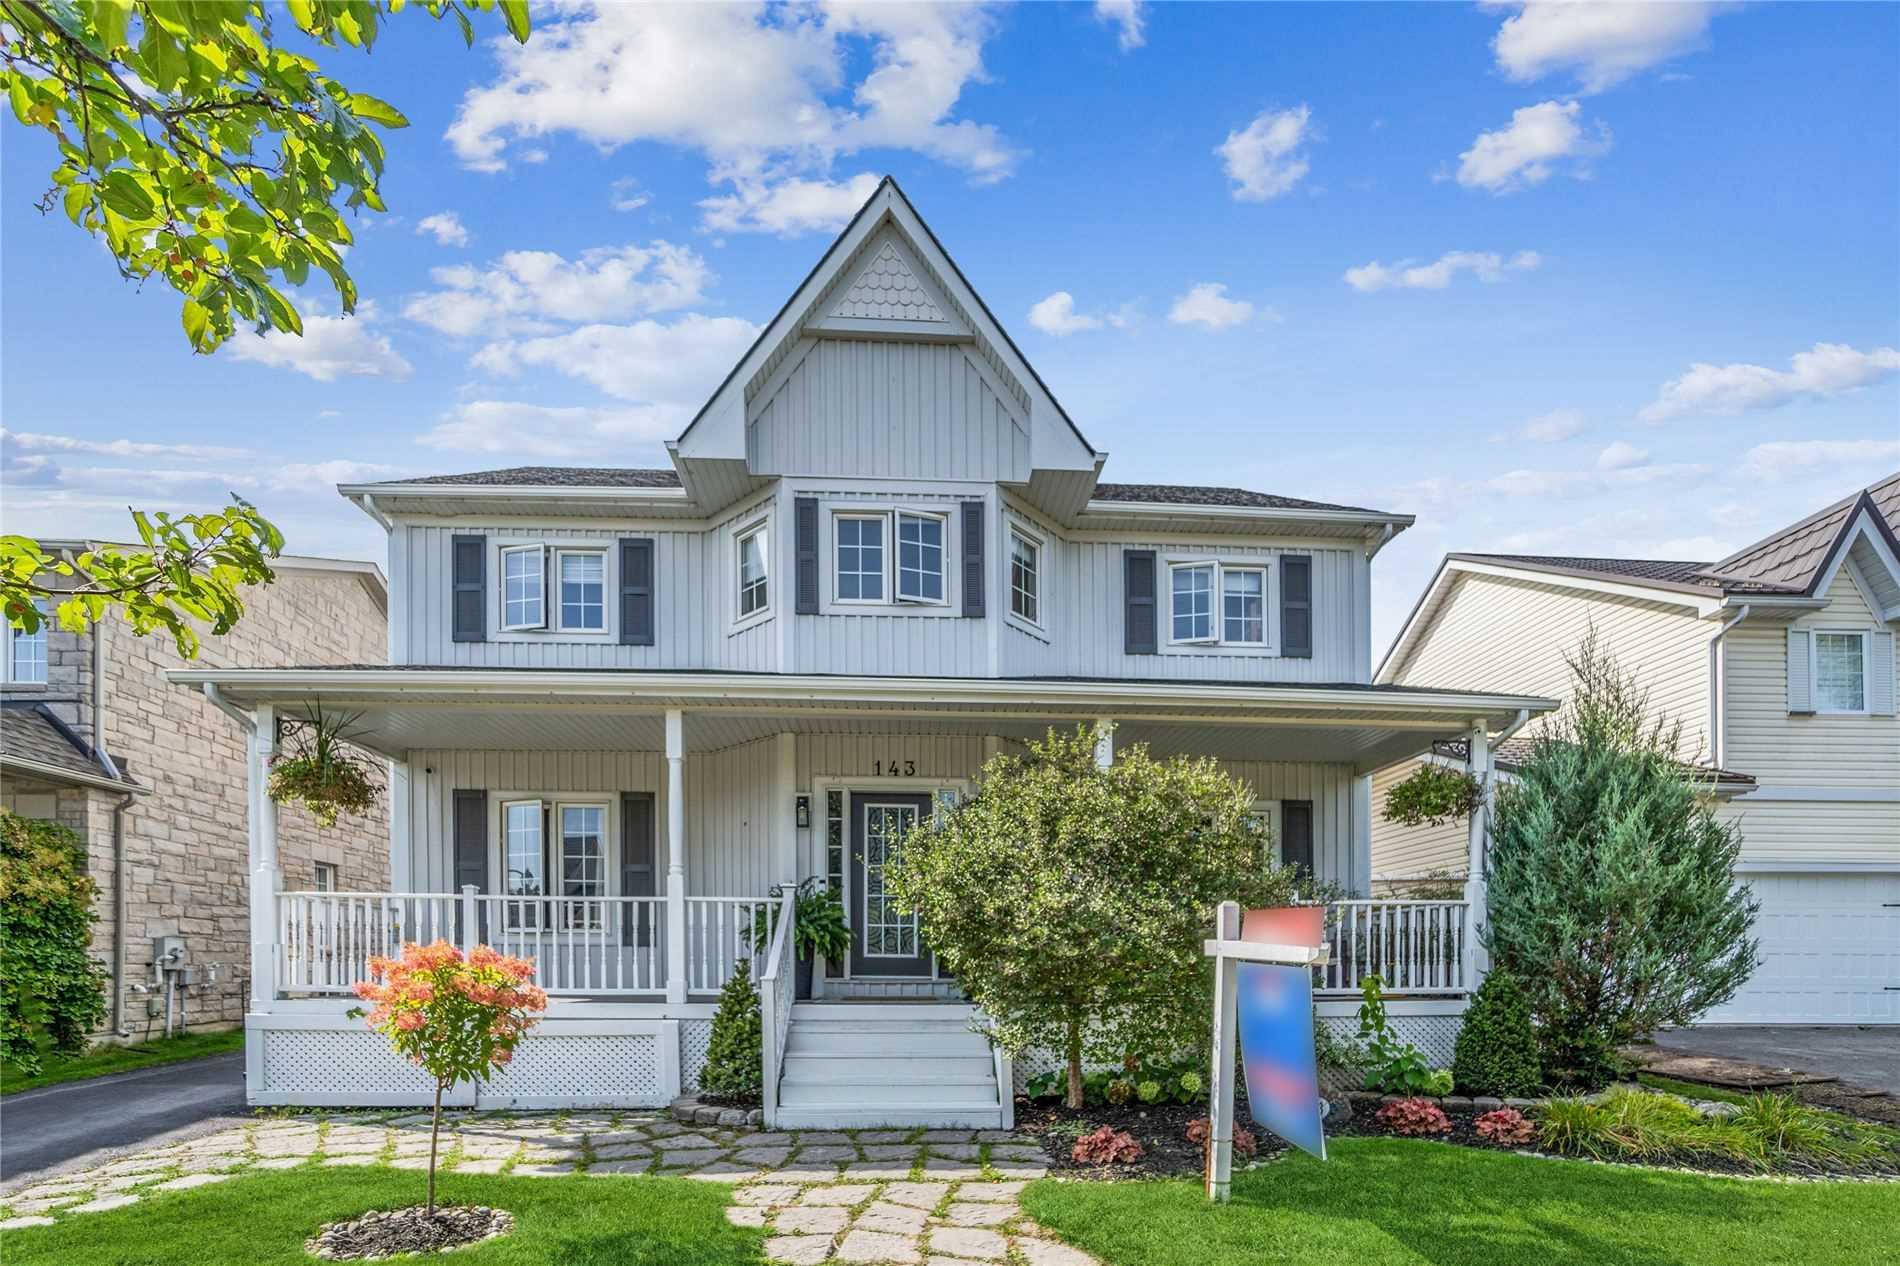 Detached house For Sale In Guelph/Eramosa - 143 Jolliffe Ave, Guelph/Eramosa, Ontario, Canada N0B 2K0 , 4 Bedrooms Bedrooms, ,4 BathroomsBathrooms,Detached,For Sale,Jolliffe